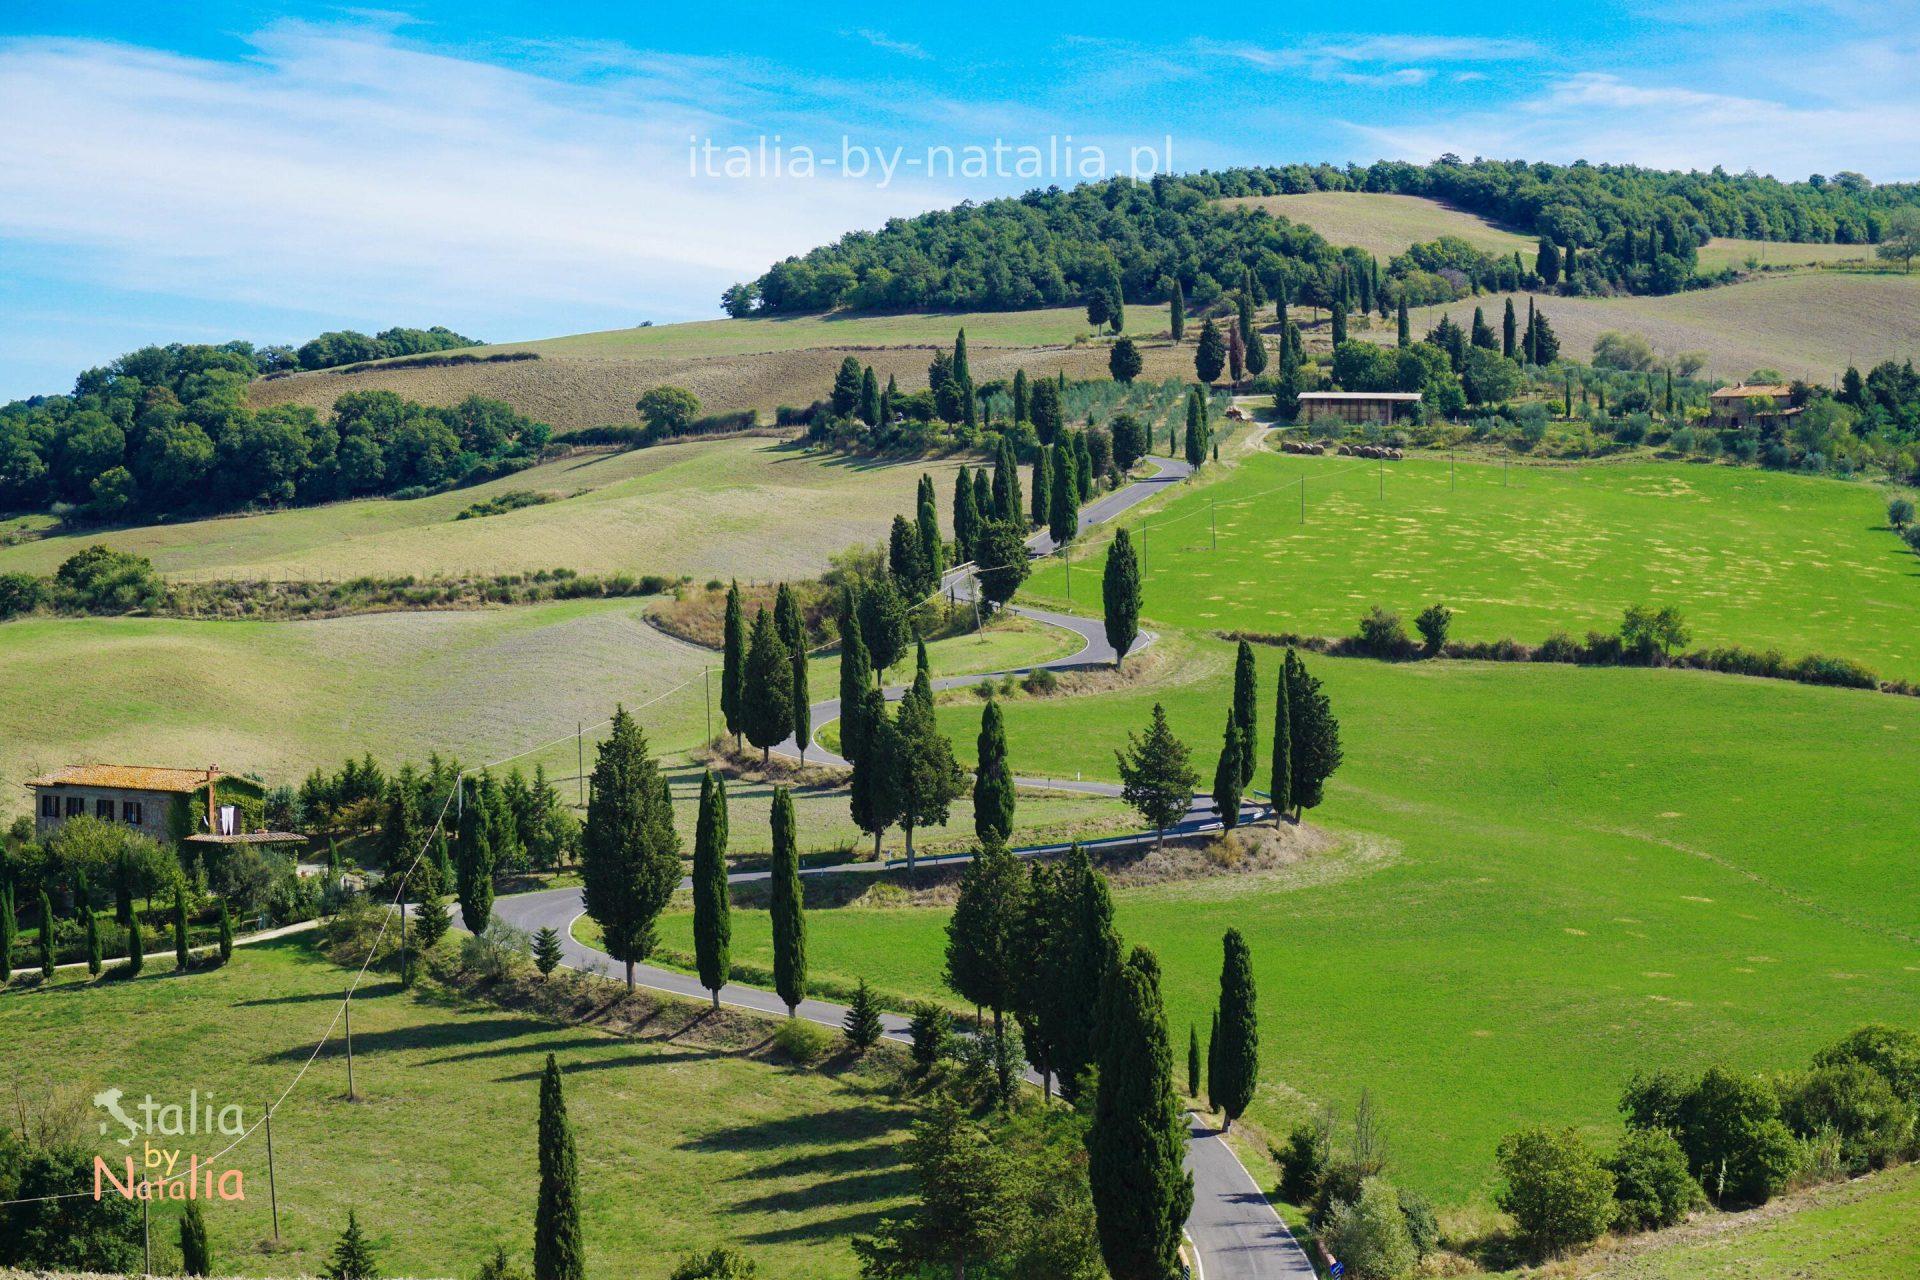 monticchiello cyprysowe drogi toskanii val d'orcia włochy tuscany italy cypresses road